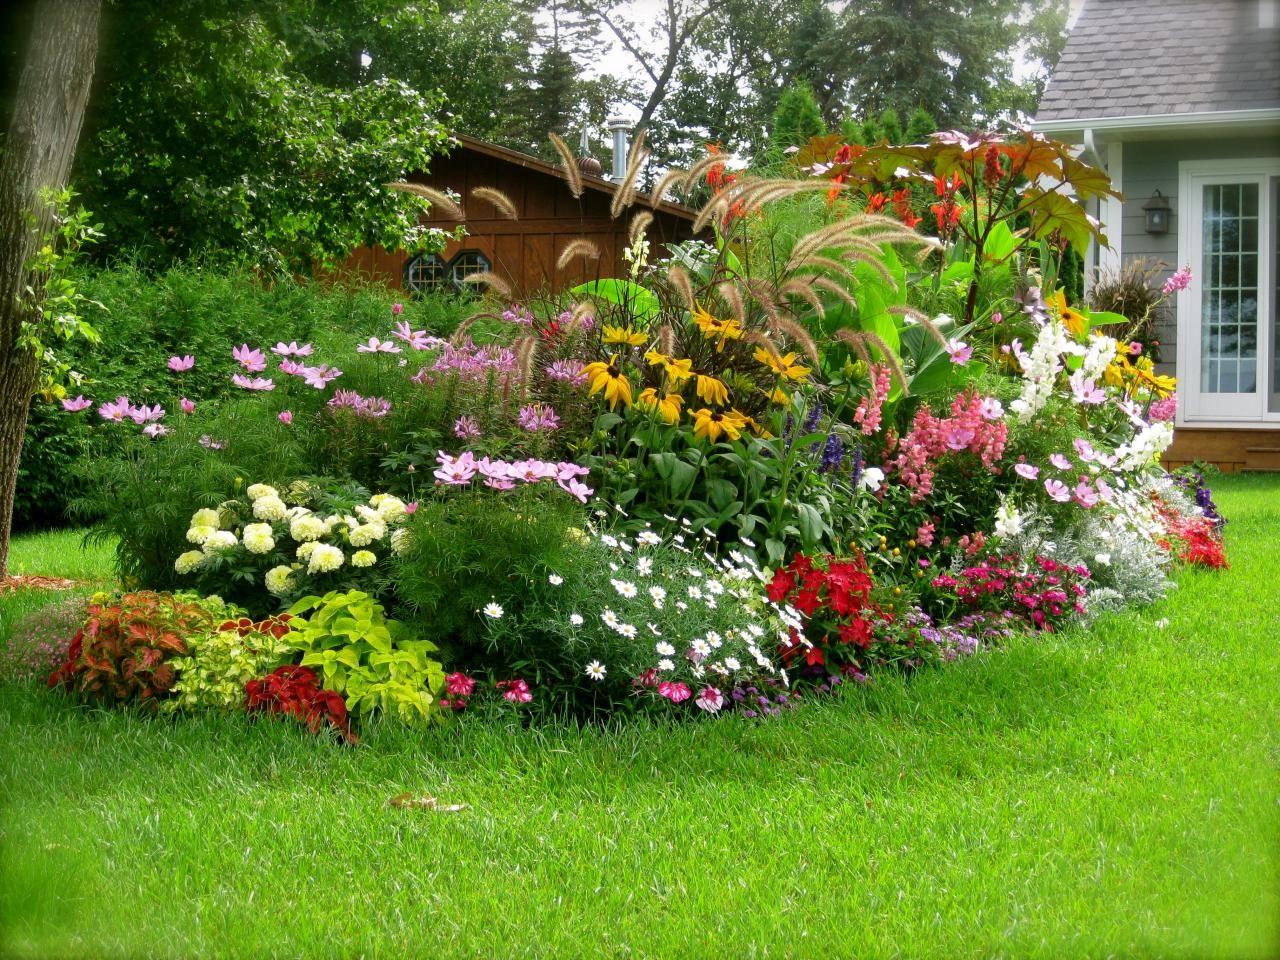 diseño de mi jardin - Buscar con Google | Diseño del jardin | Pinterest